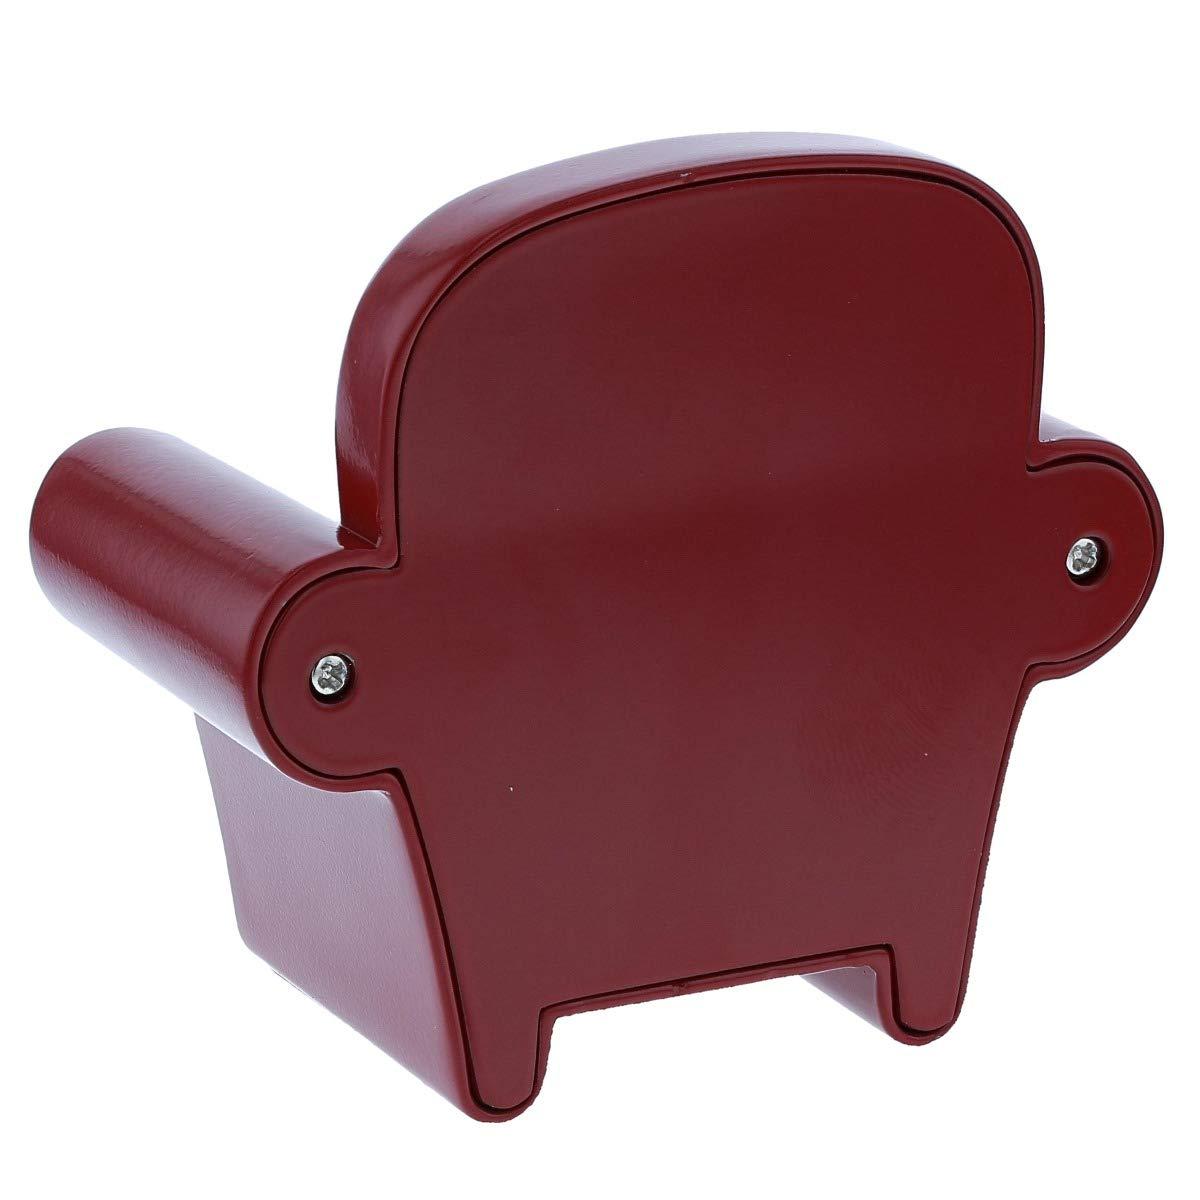 Miniature Armchair Sofa Clock Burgundy Red Couch Novelty Desktop Collectors Clock TM19